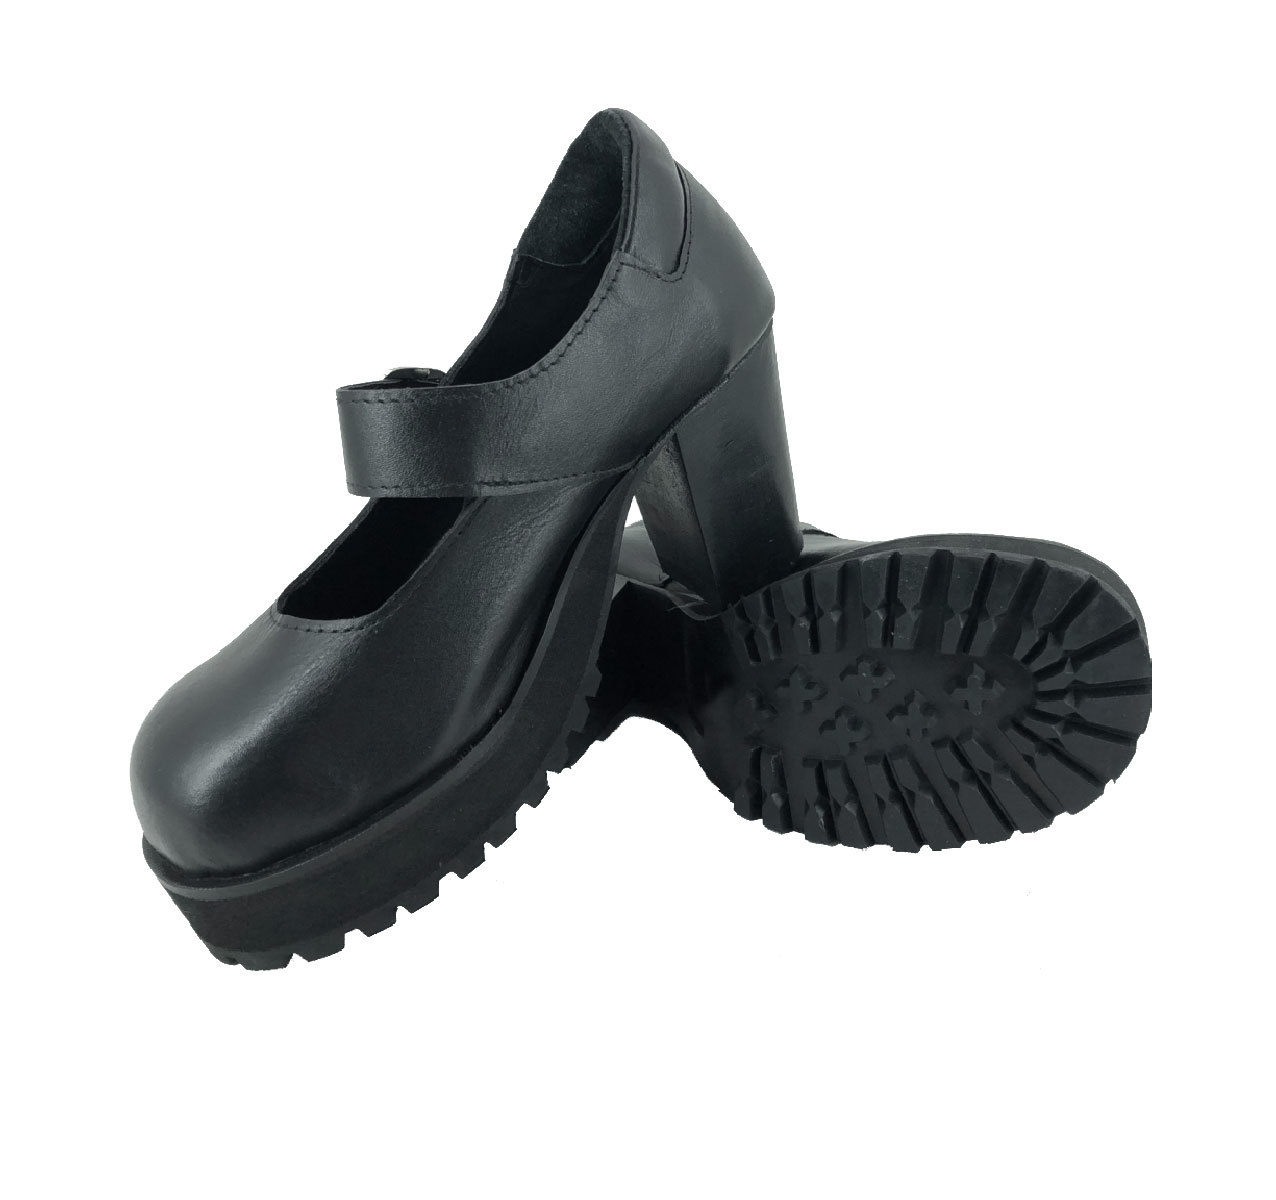 Sapato Boneca Salto Alto 1/2 Plataforma Liso Couro Ref176